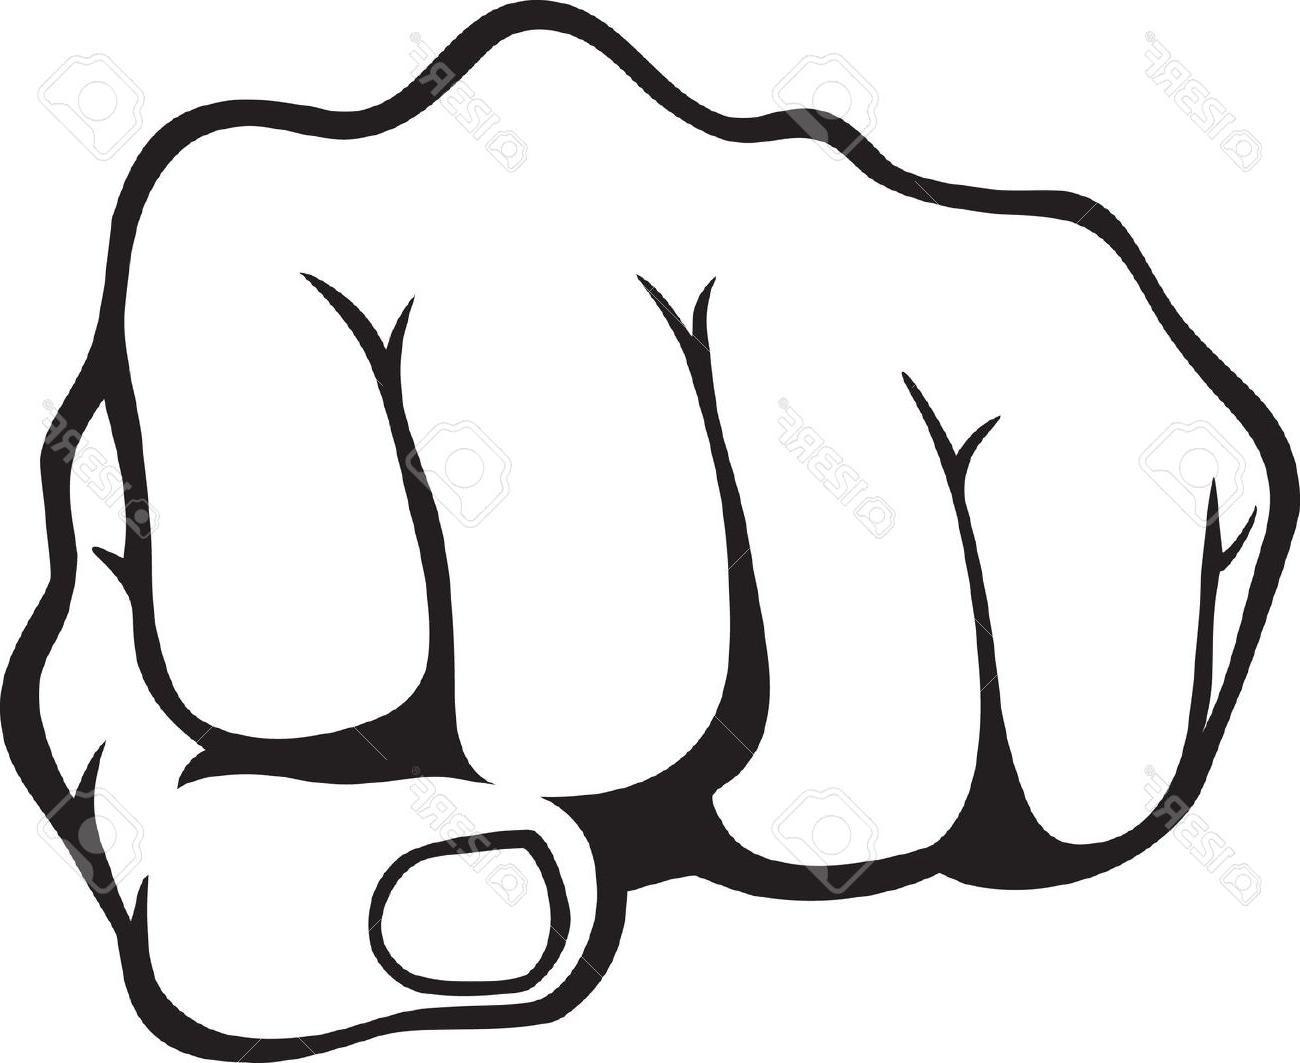 Fist Clipart Simple Picture 2706164 Fist Clipart Simple New users enjoy 60% off. picture 2706164 fist clipart simple